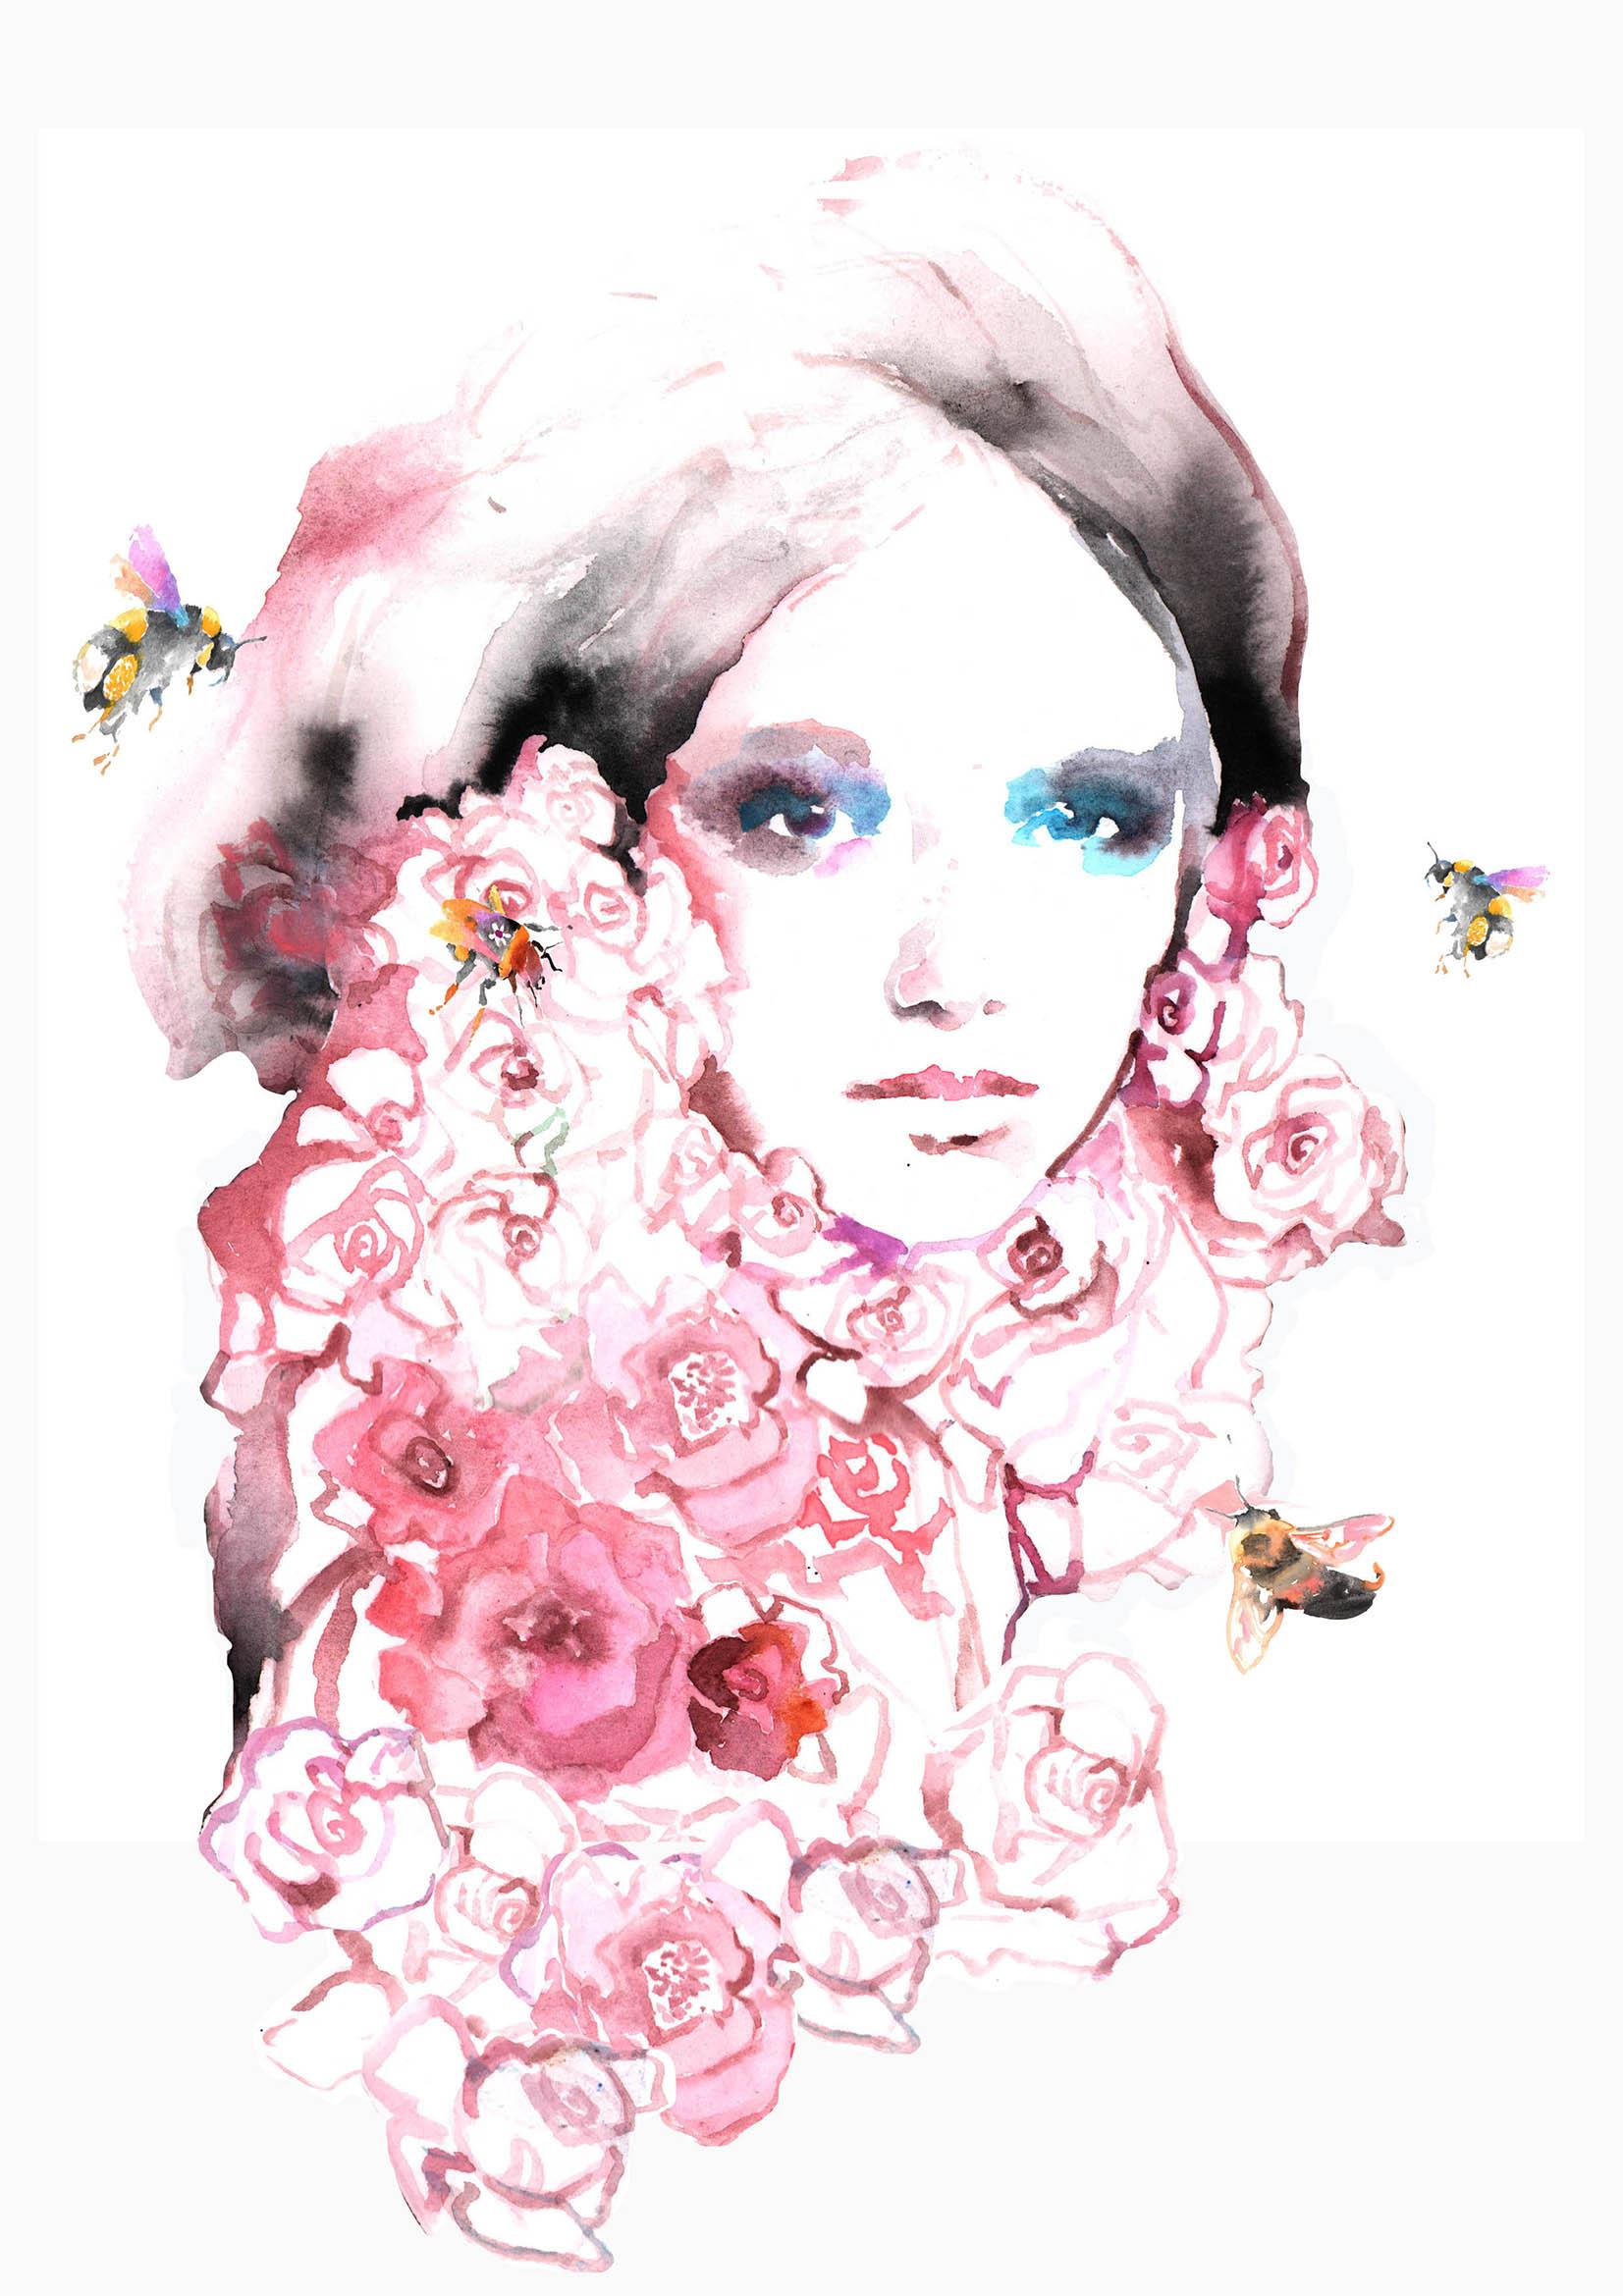 Briar Rose 'Save the Bees'